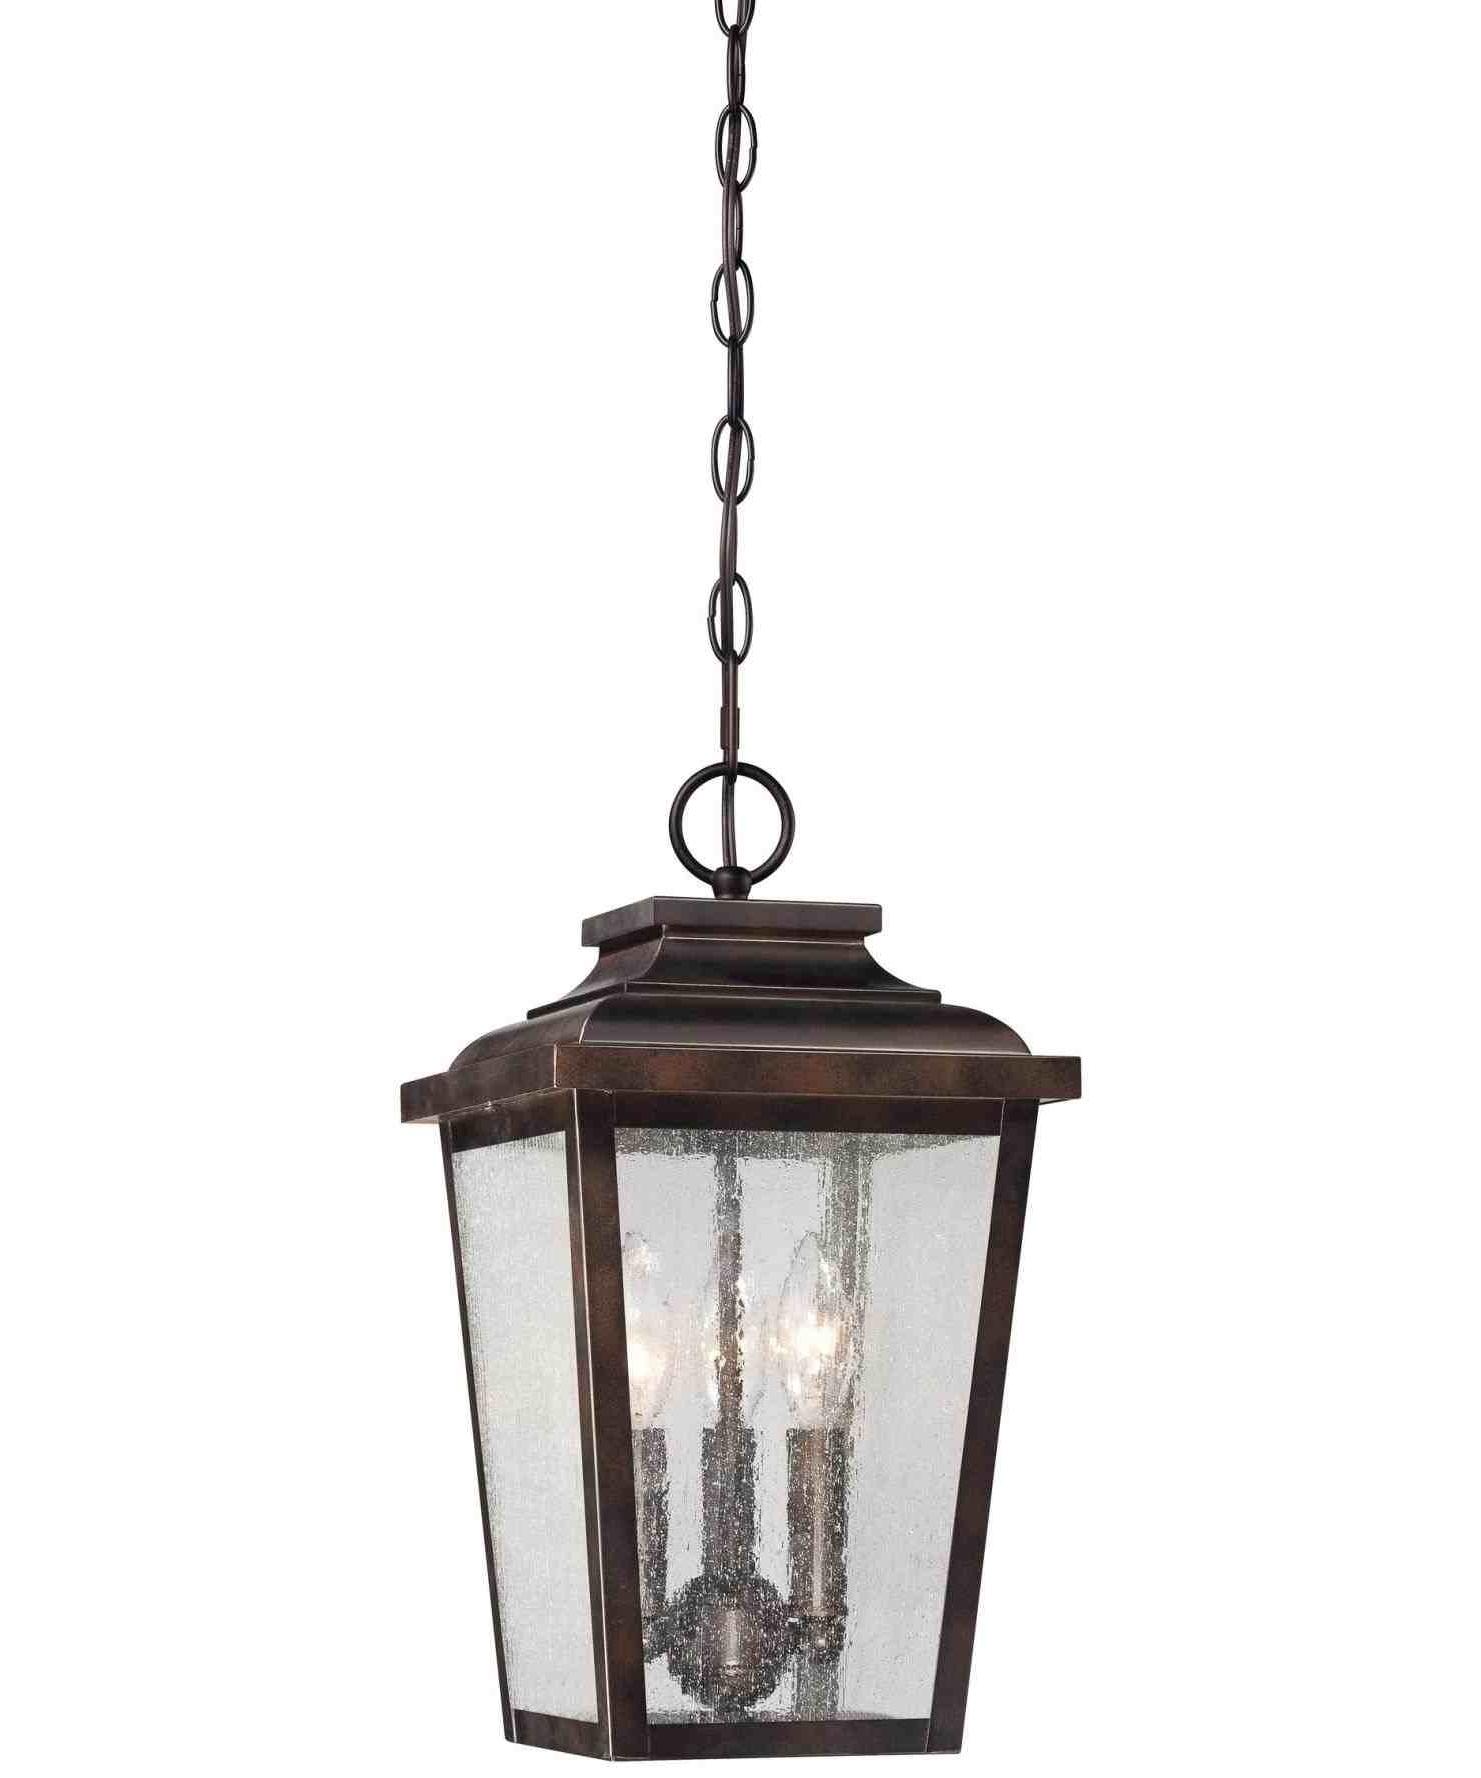 Hinkley Outdoor Hanging Lighting Lighting Edgewater Inch Wide Throughout Popular Hinkley Outdoor Hanging Lights (View 13 of 20)